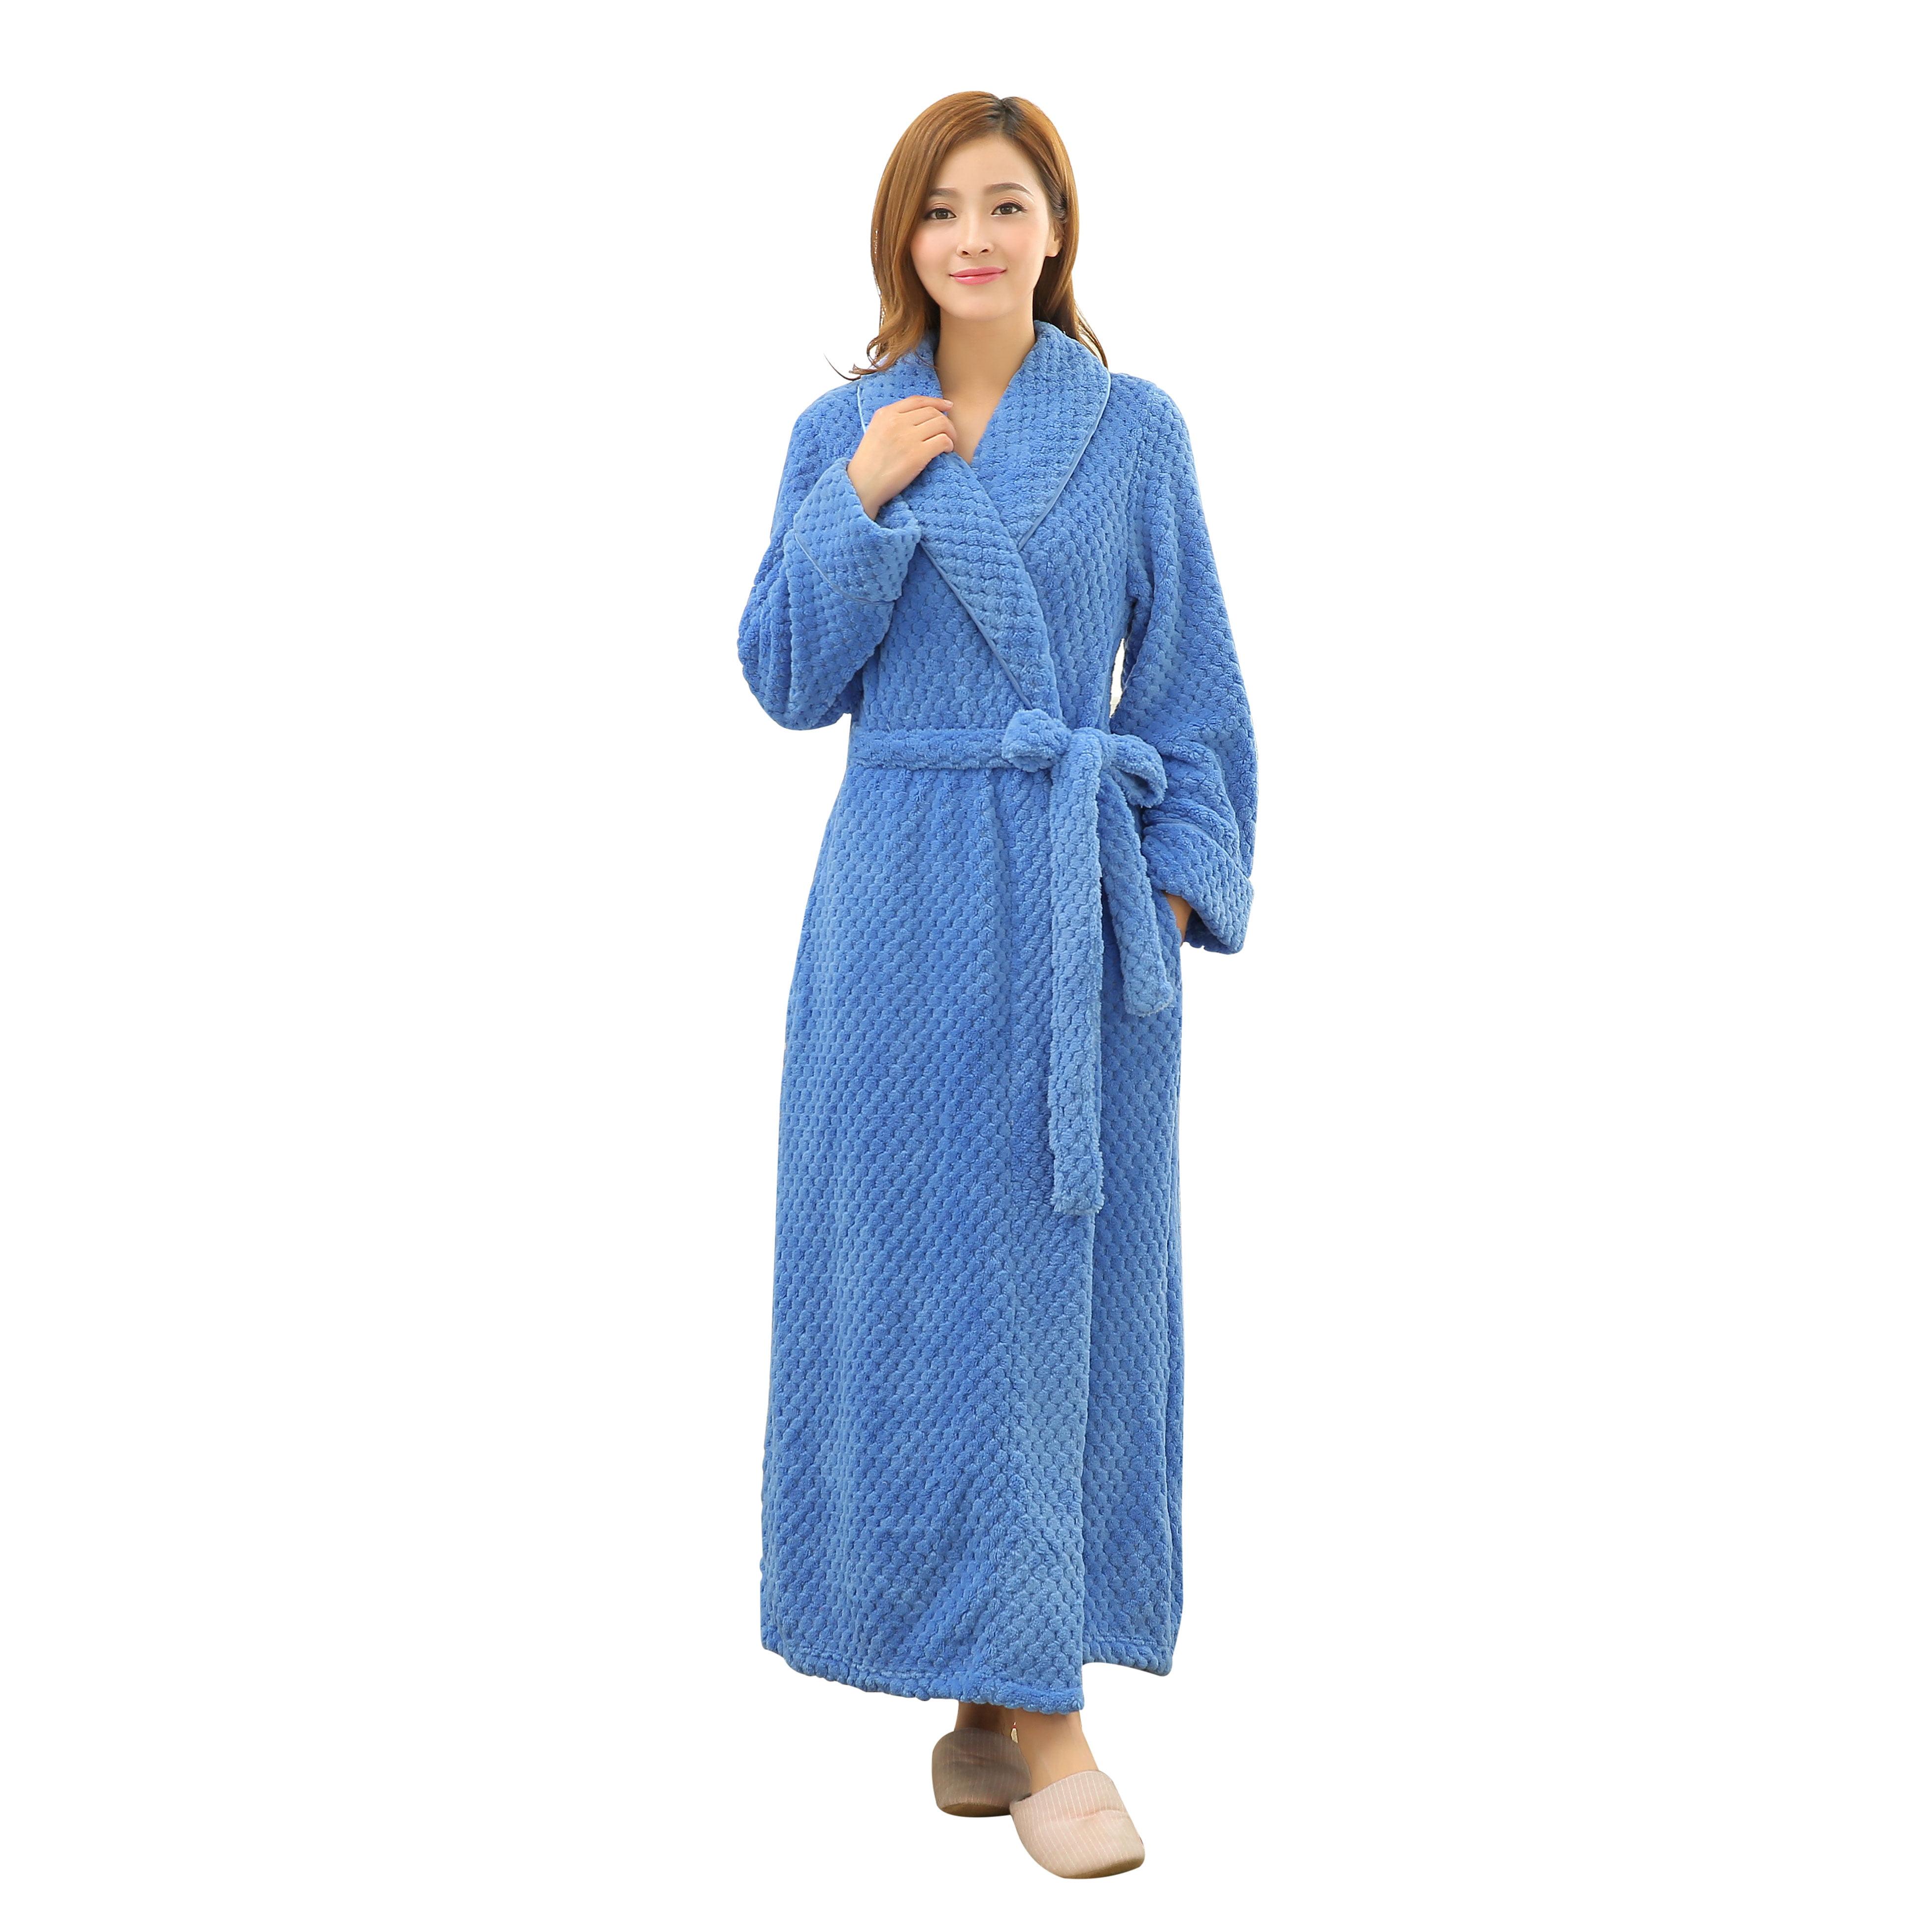 1x Women/'s Smooth Loose Fit Bathrobe Bird Pattern Long Robe Dress Gown Sleepwear